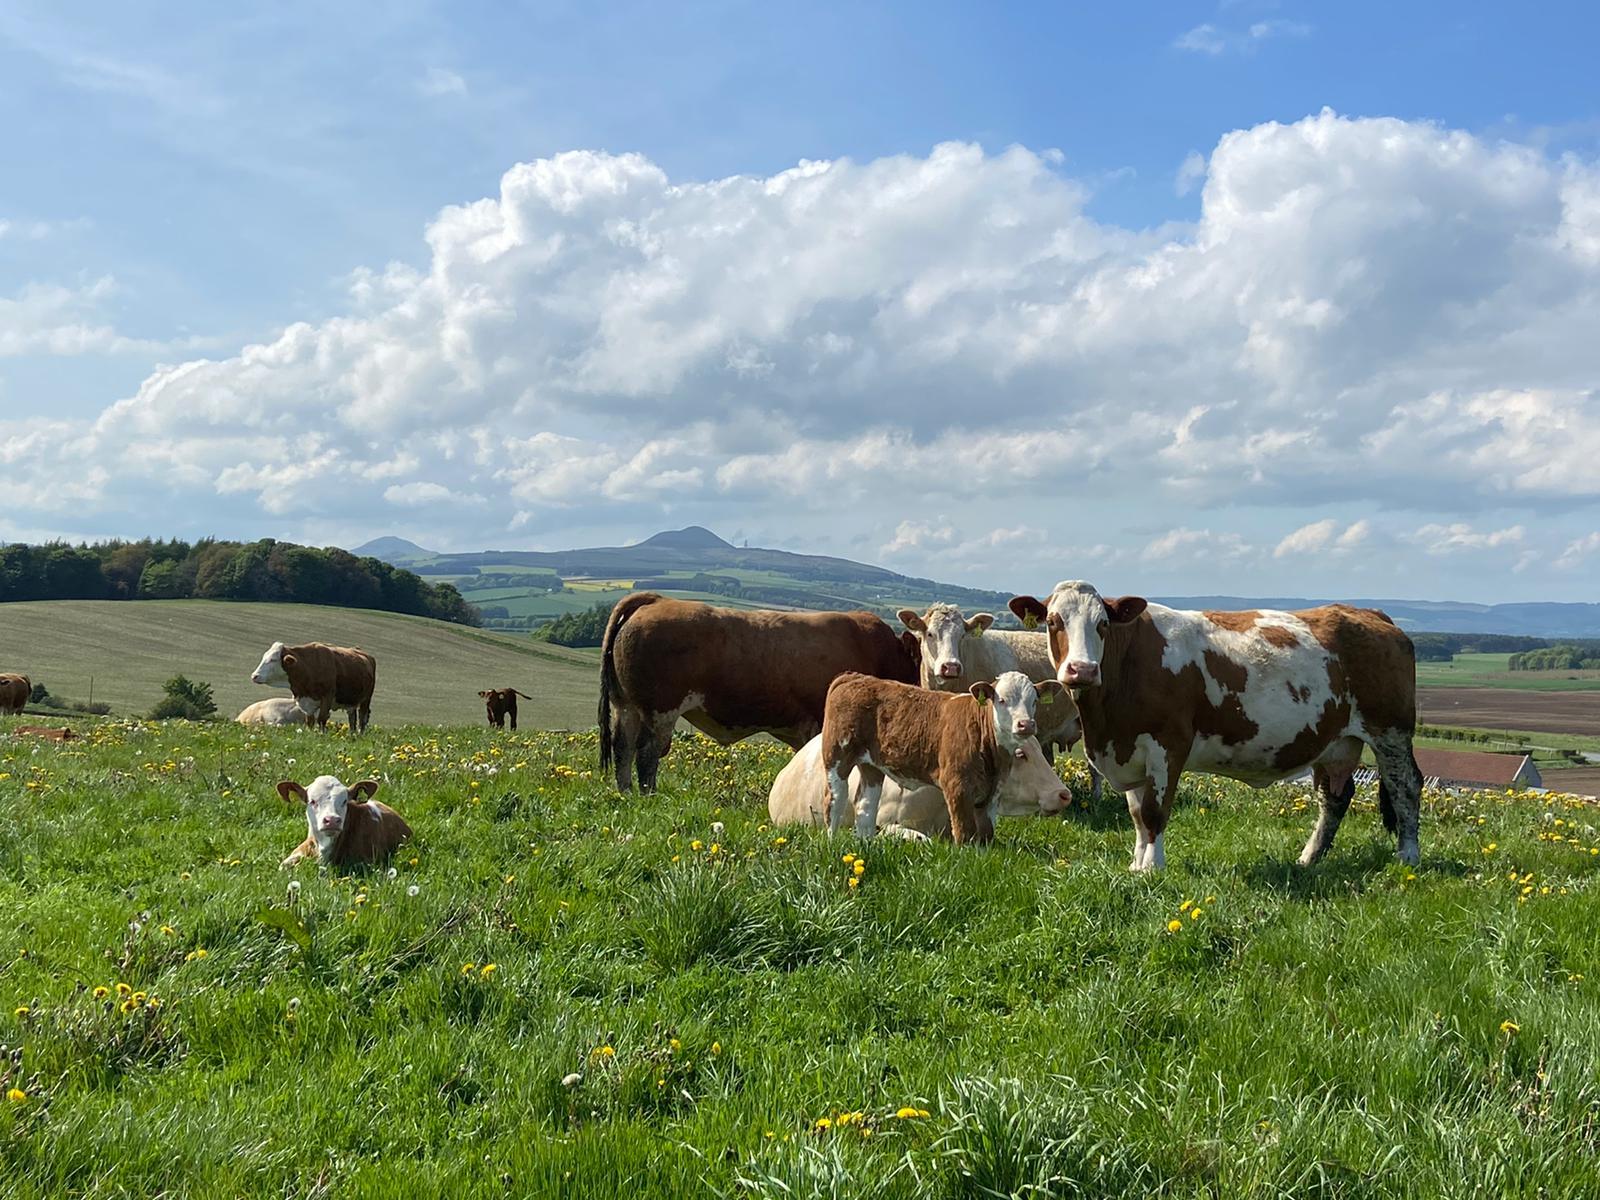 'Pasture for Life' makes good financial sense